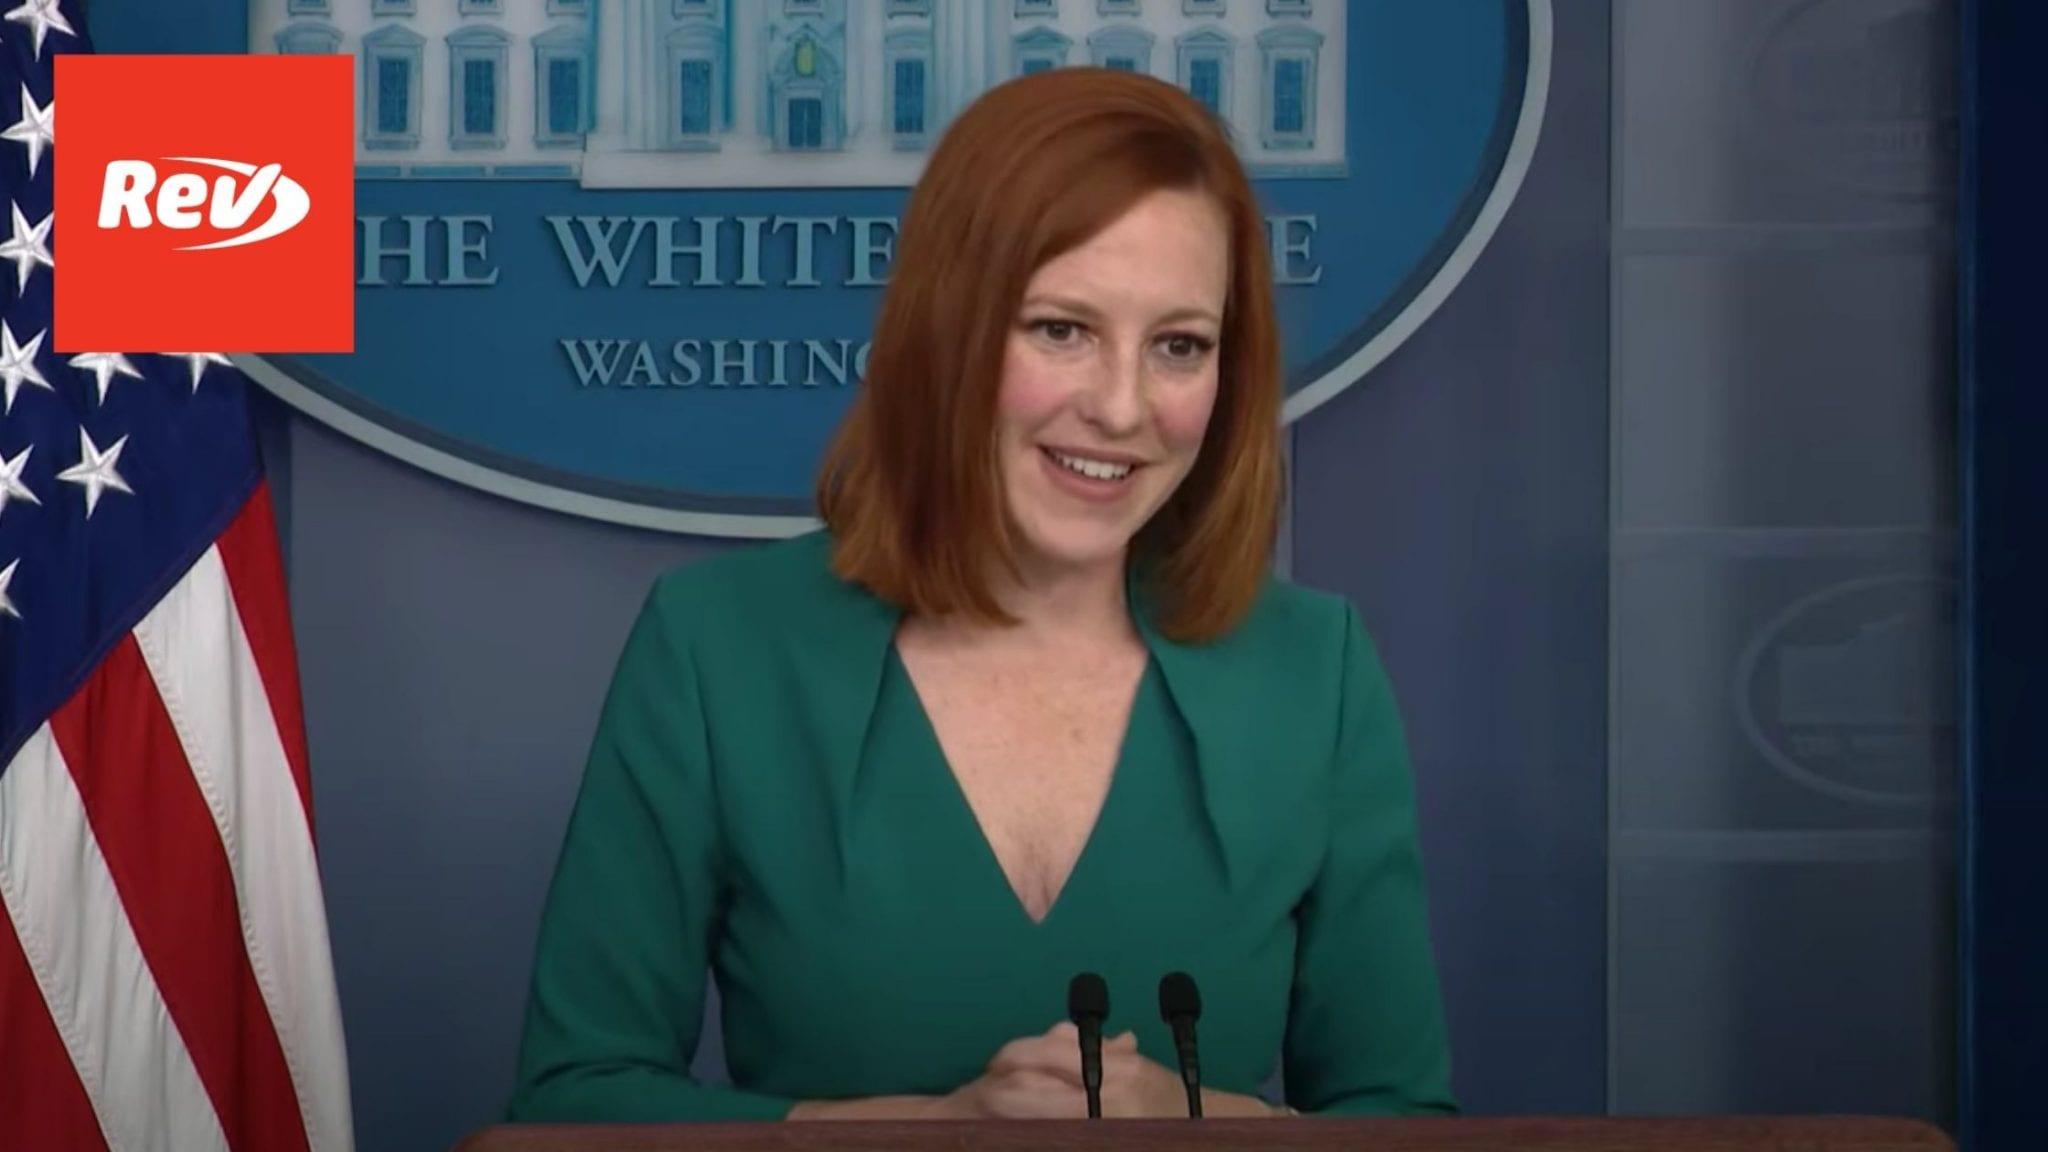 Press Secretary Jen Psaki White House Press Conference Transcript May 25